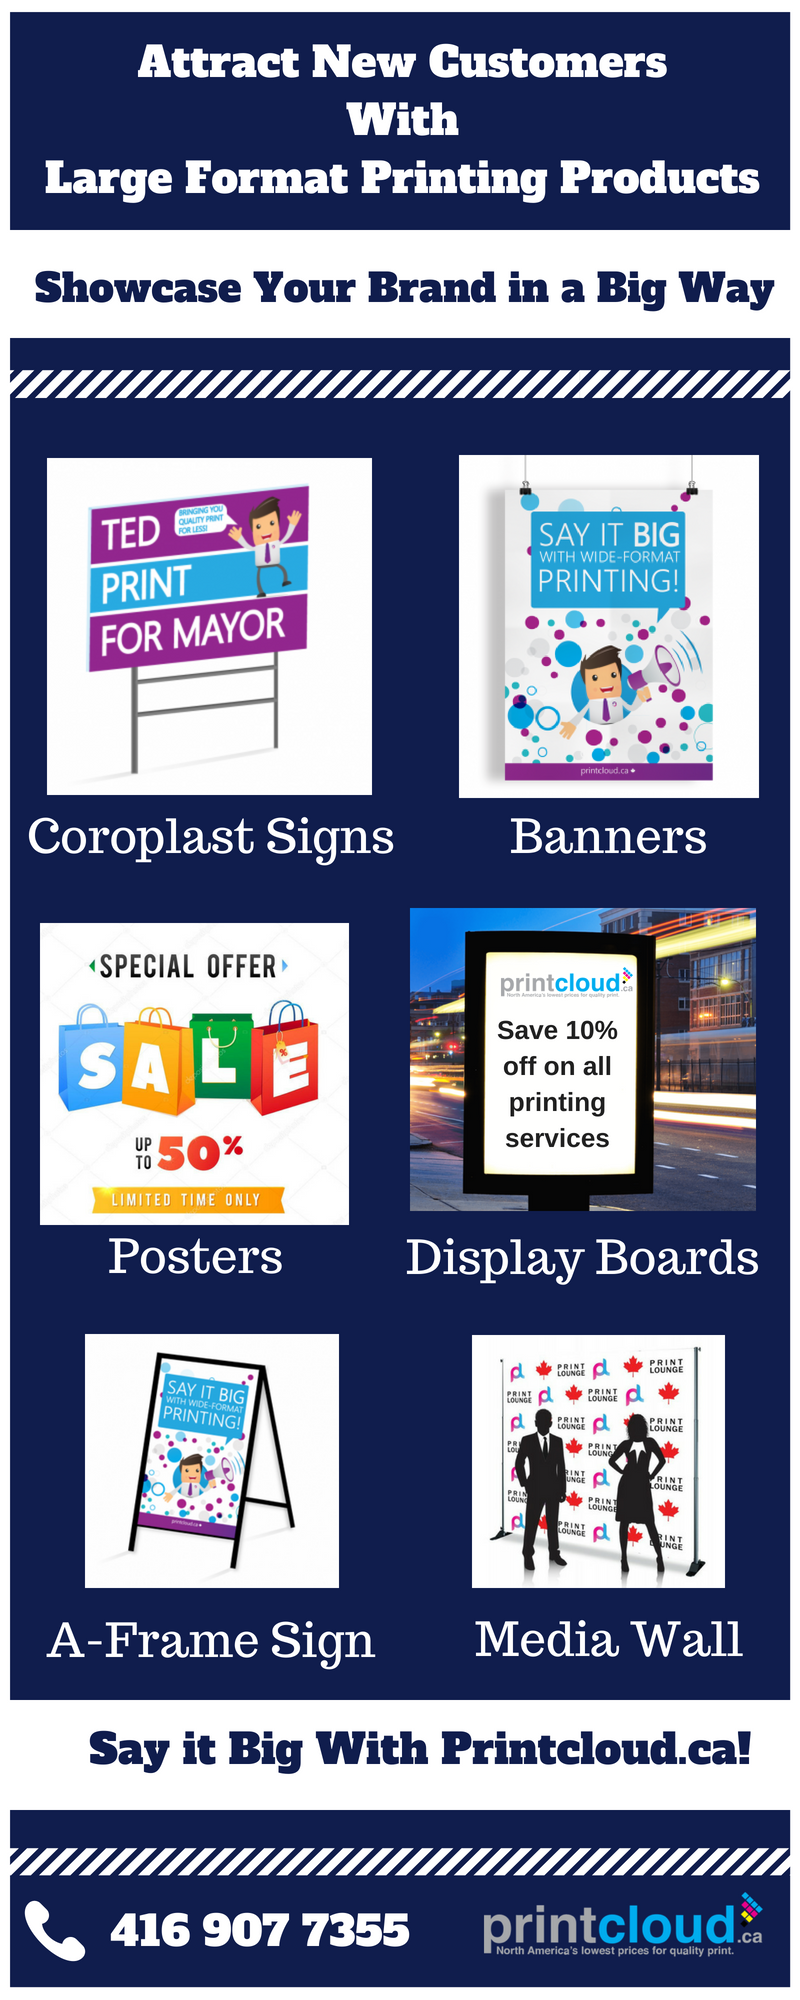 Best Wide Format Printer For Banners - Best Banner Design 2018